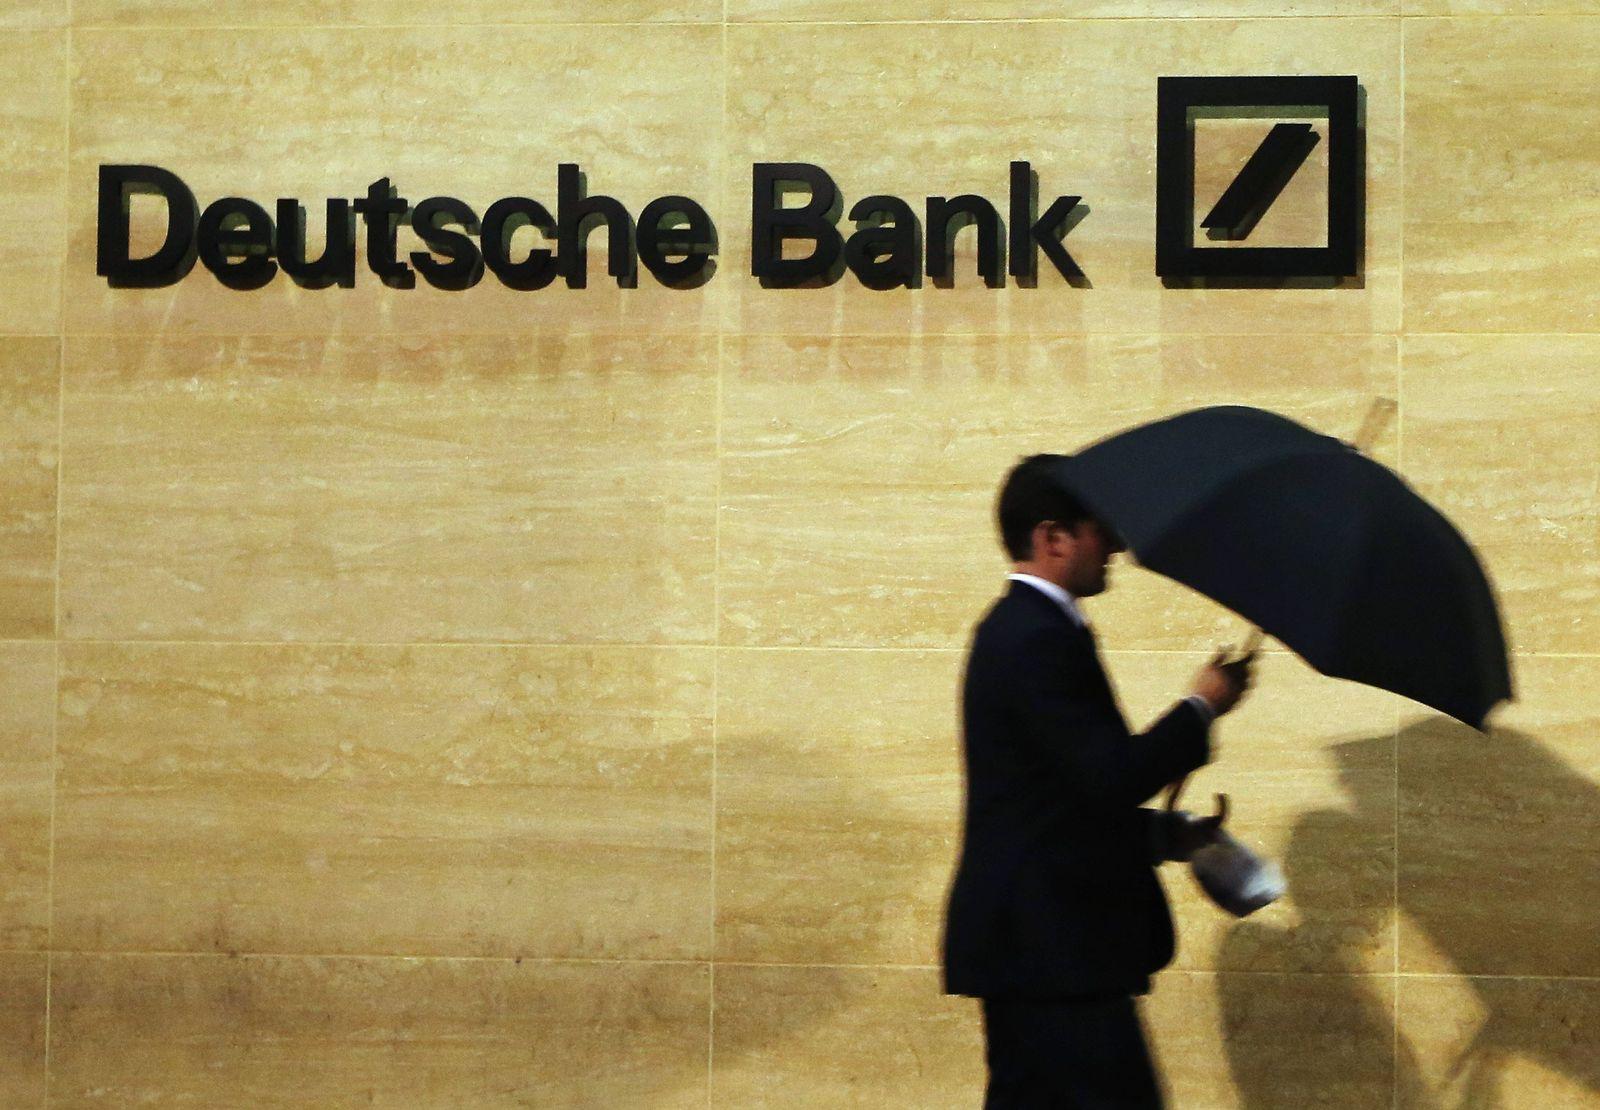 Deutsche Bank / London / England